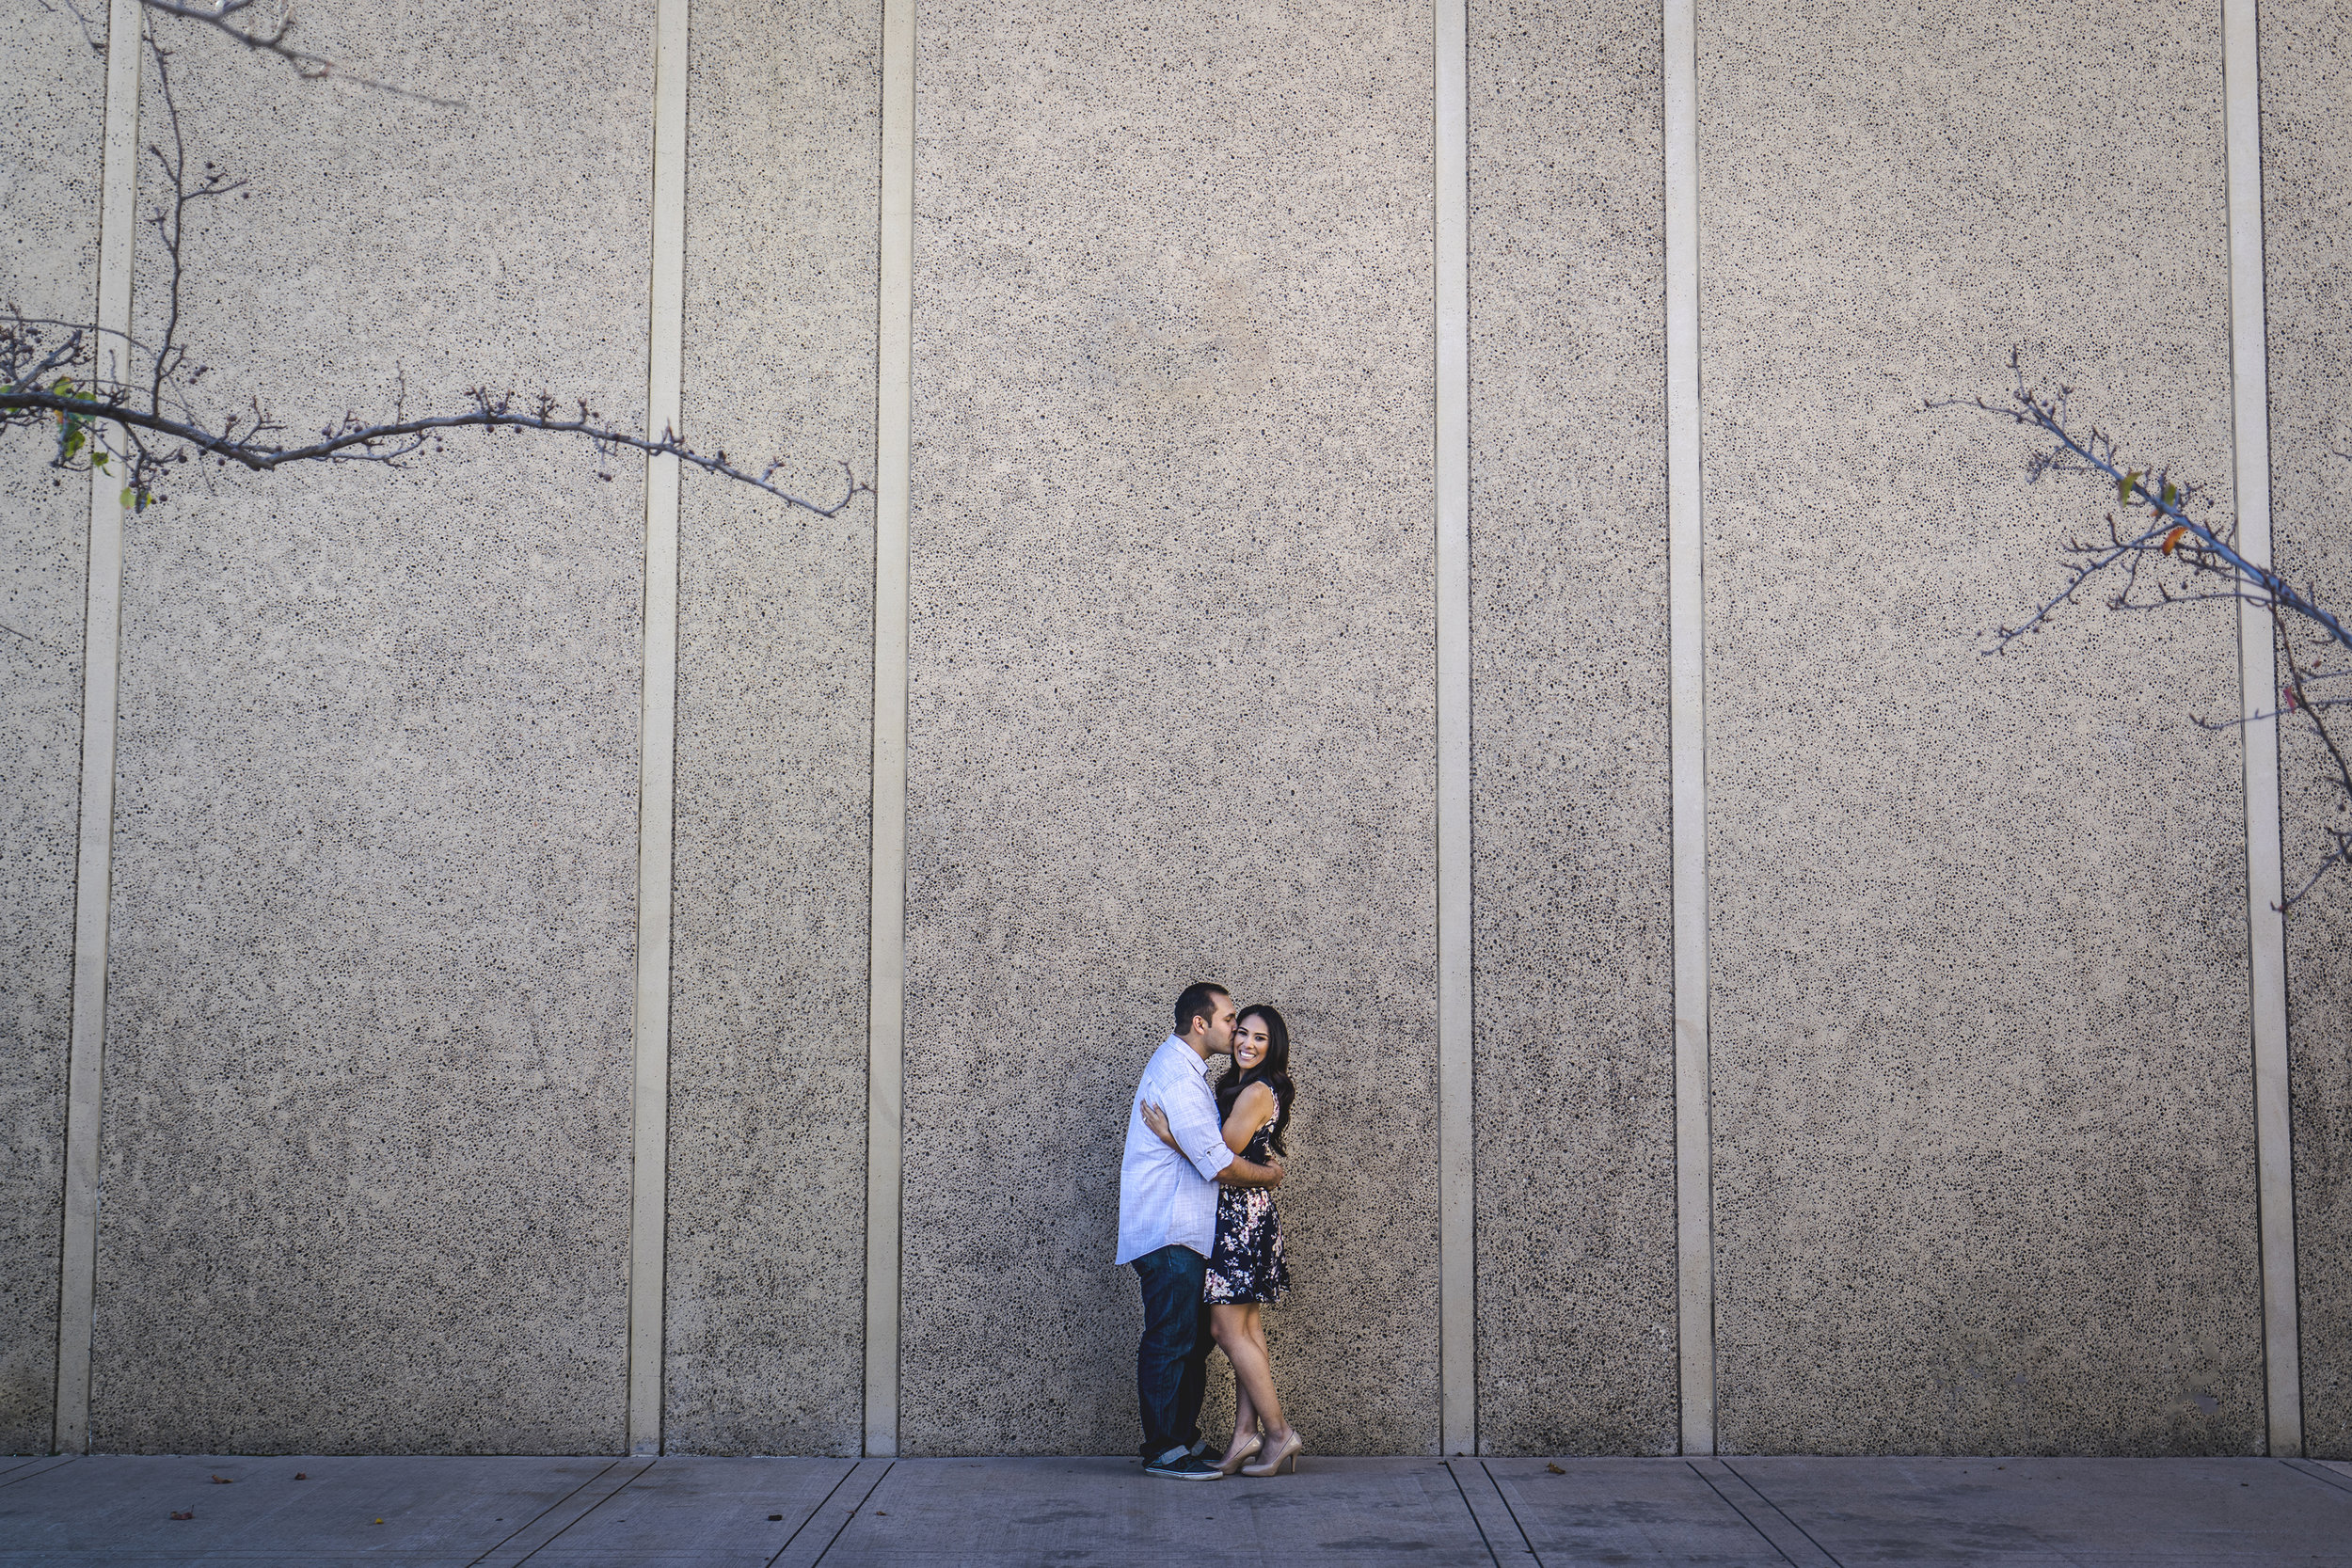 Andrea + Frank Engagement Photography_44 50%.jpg